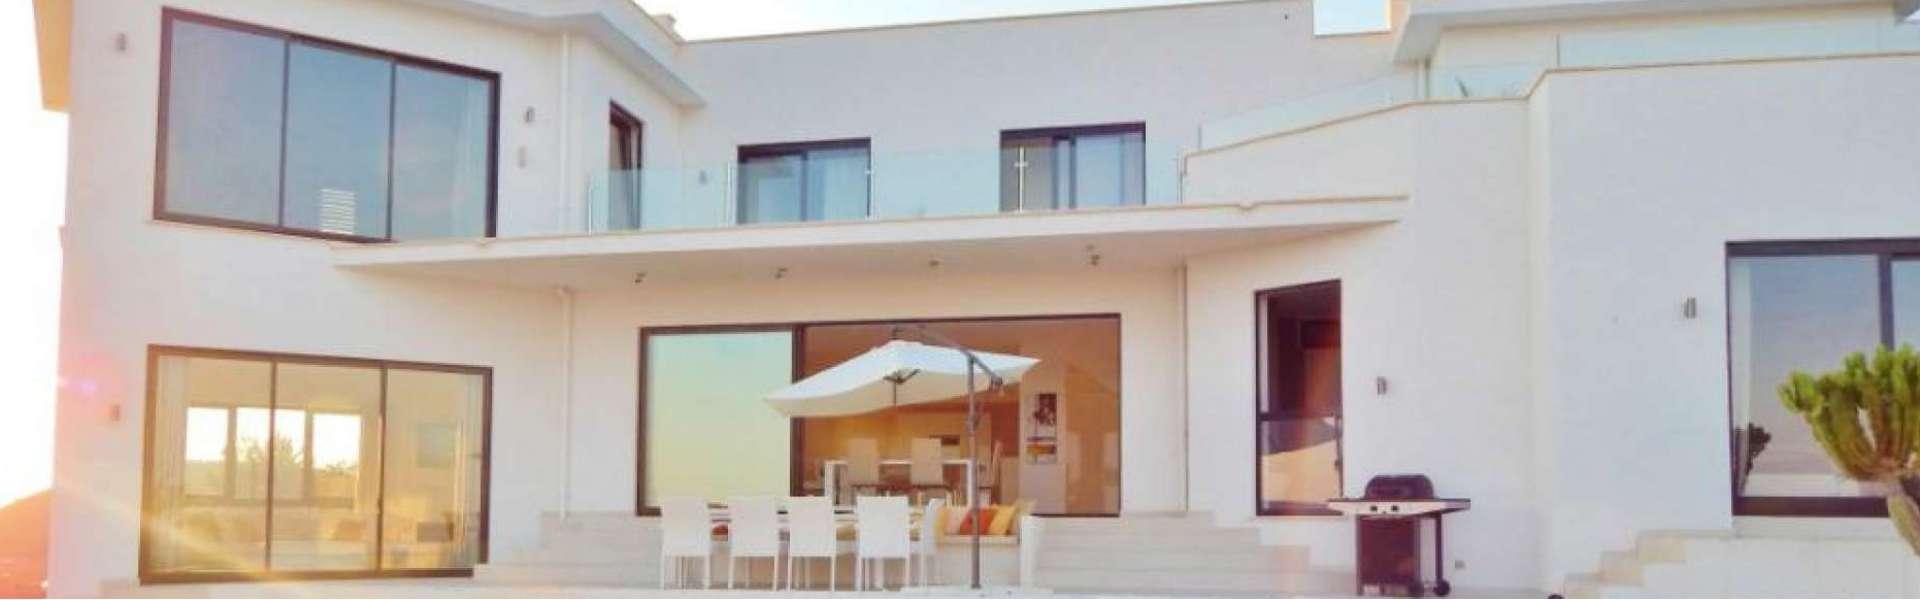 Cala Vinyas - Imposing villa with sea view